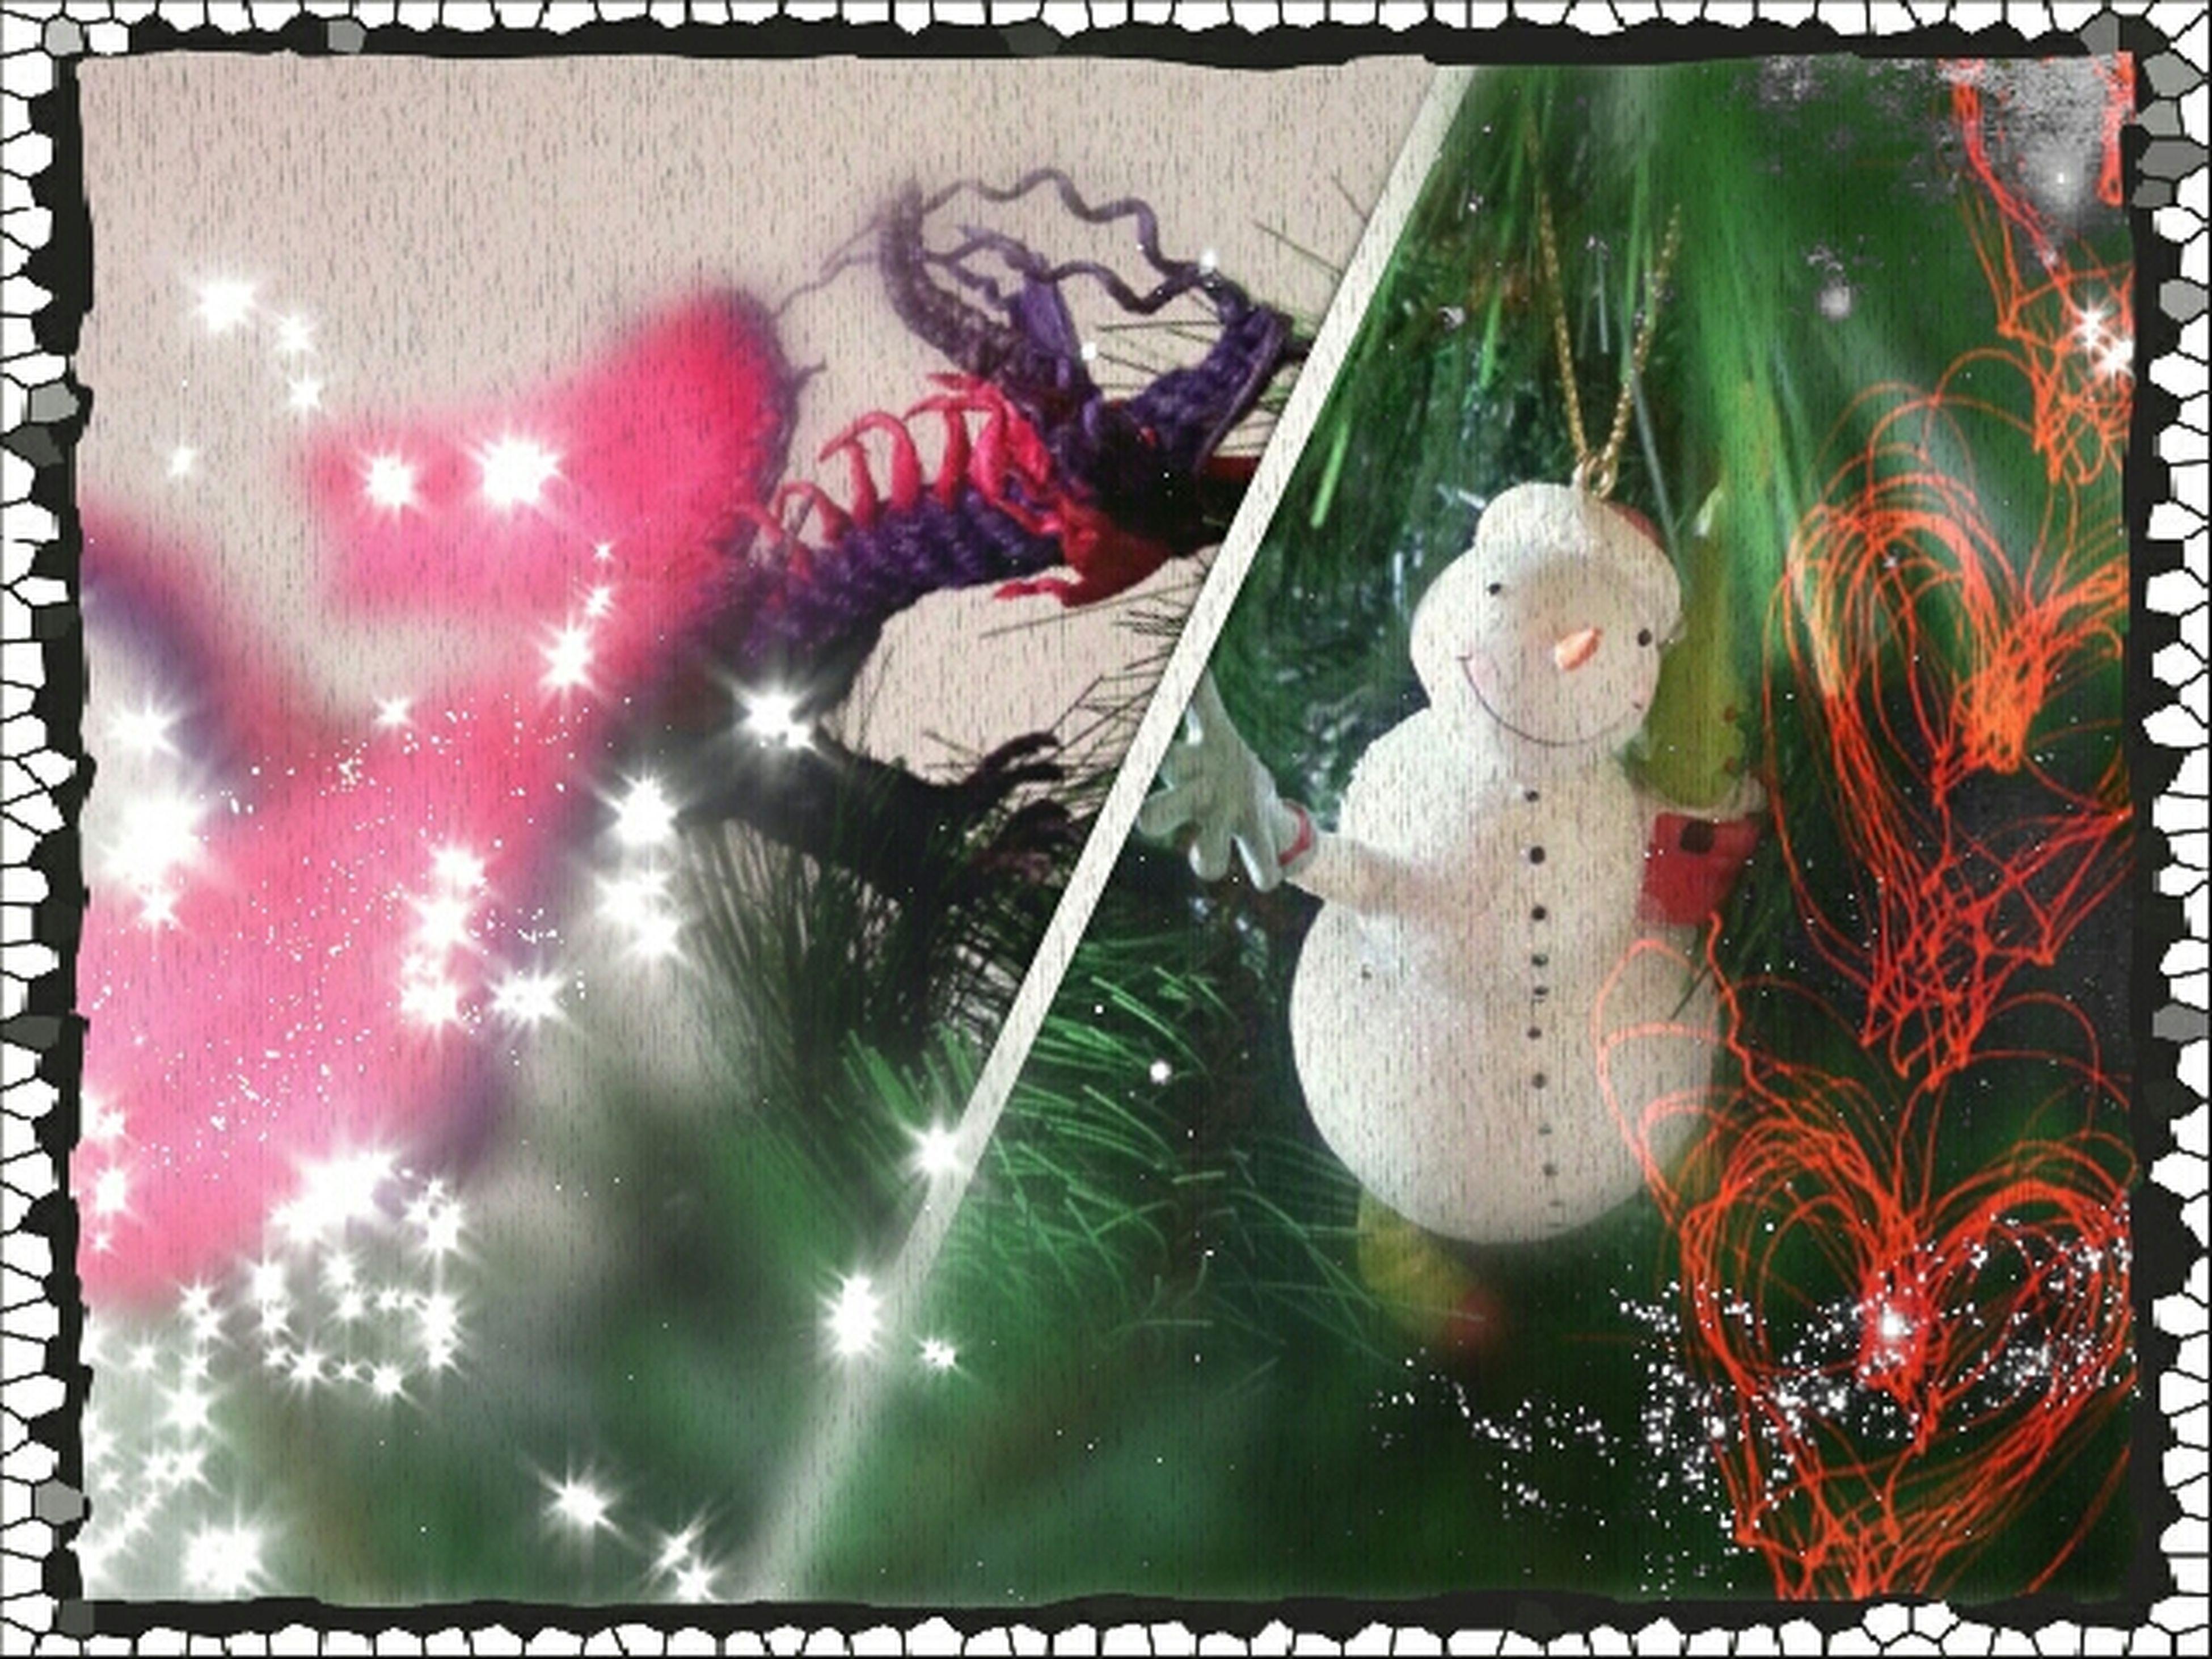 Bon Nadal! ¡Feliz Navidad!